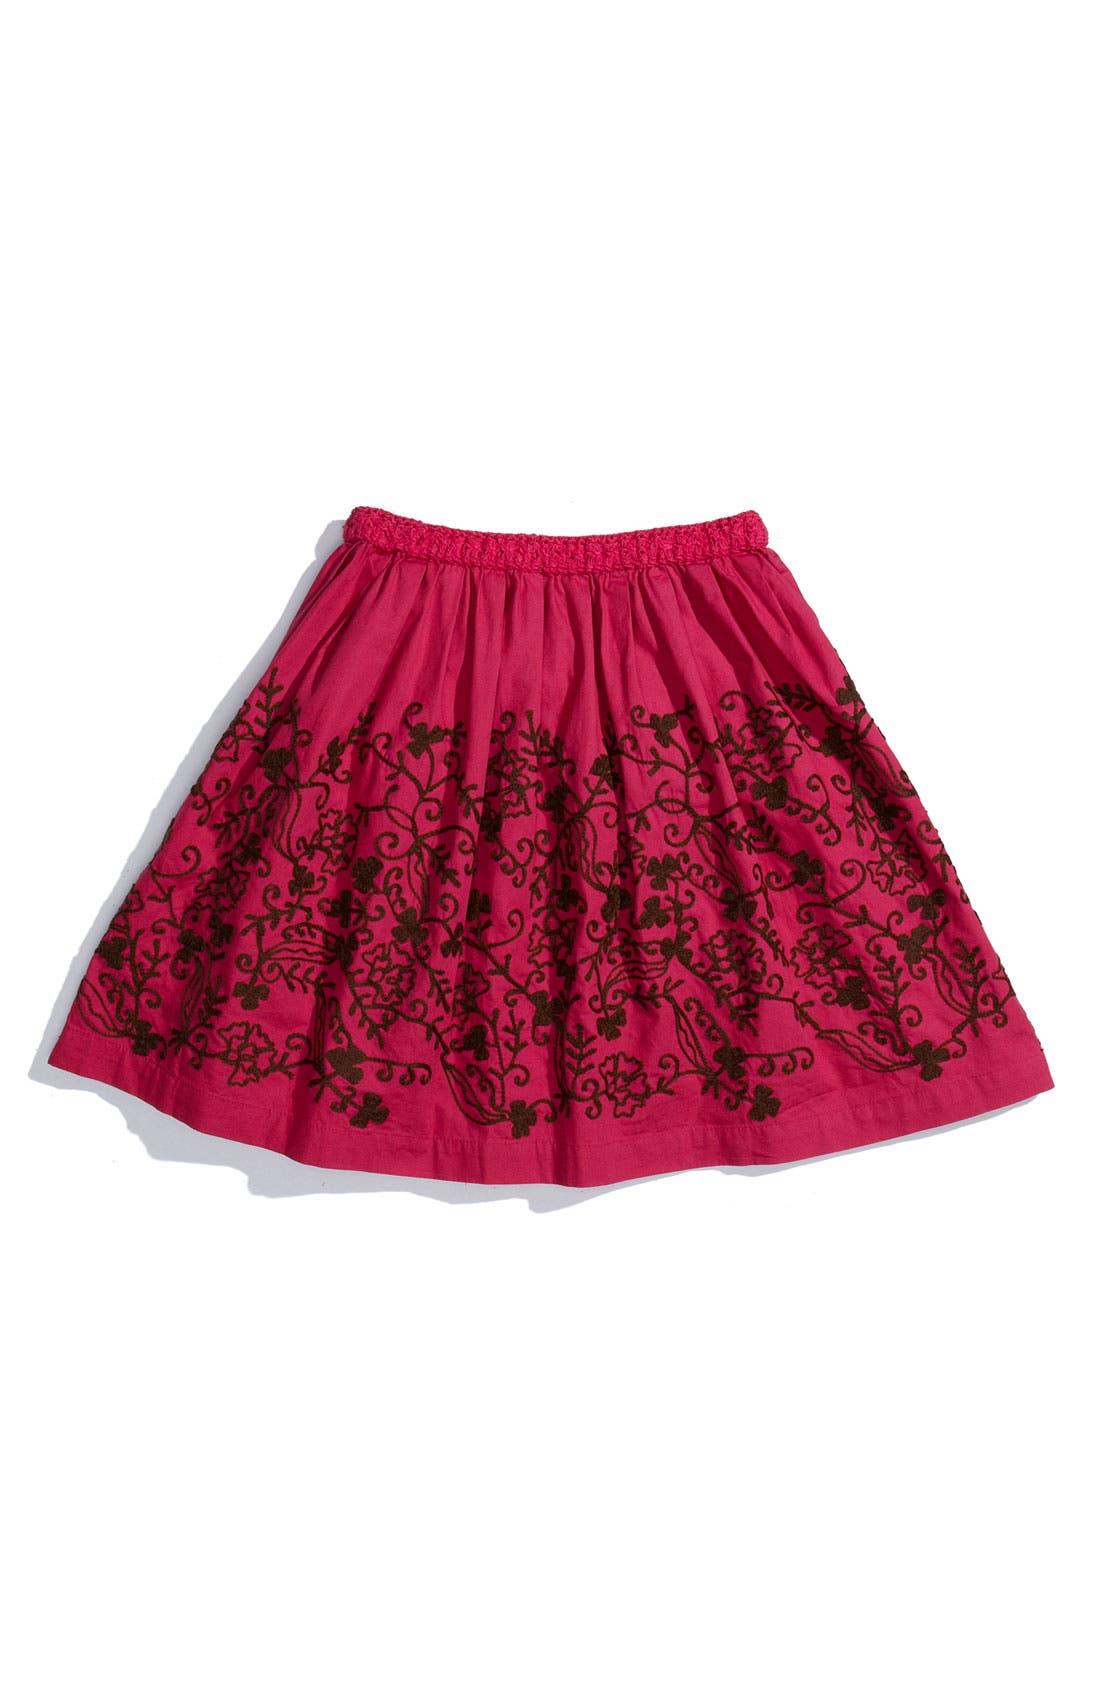 Main Image - Peek 'Frida' Skirt (Toddler, Little Girls & Big Girls)